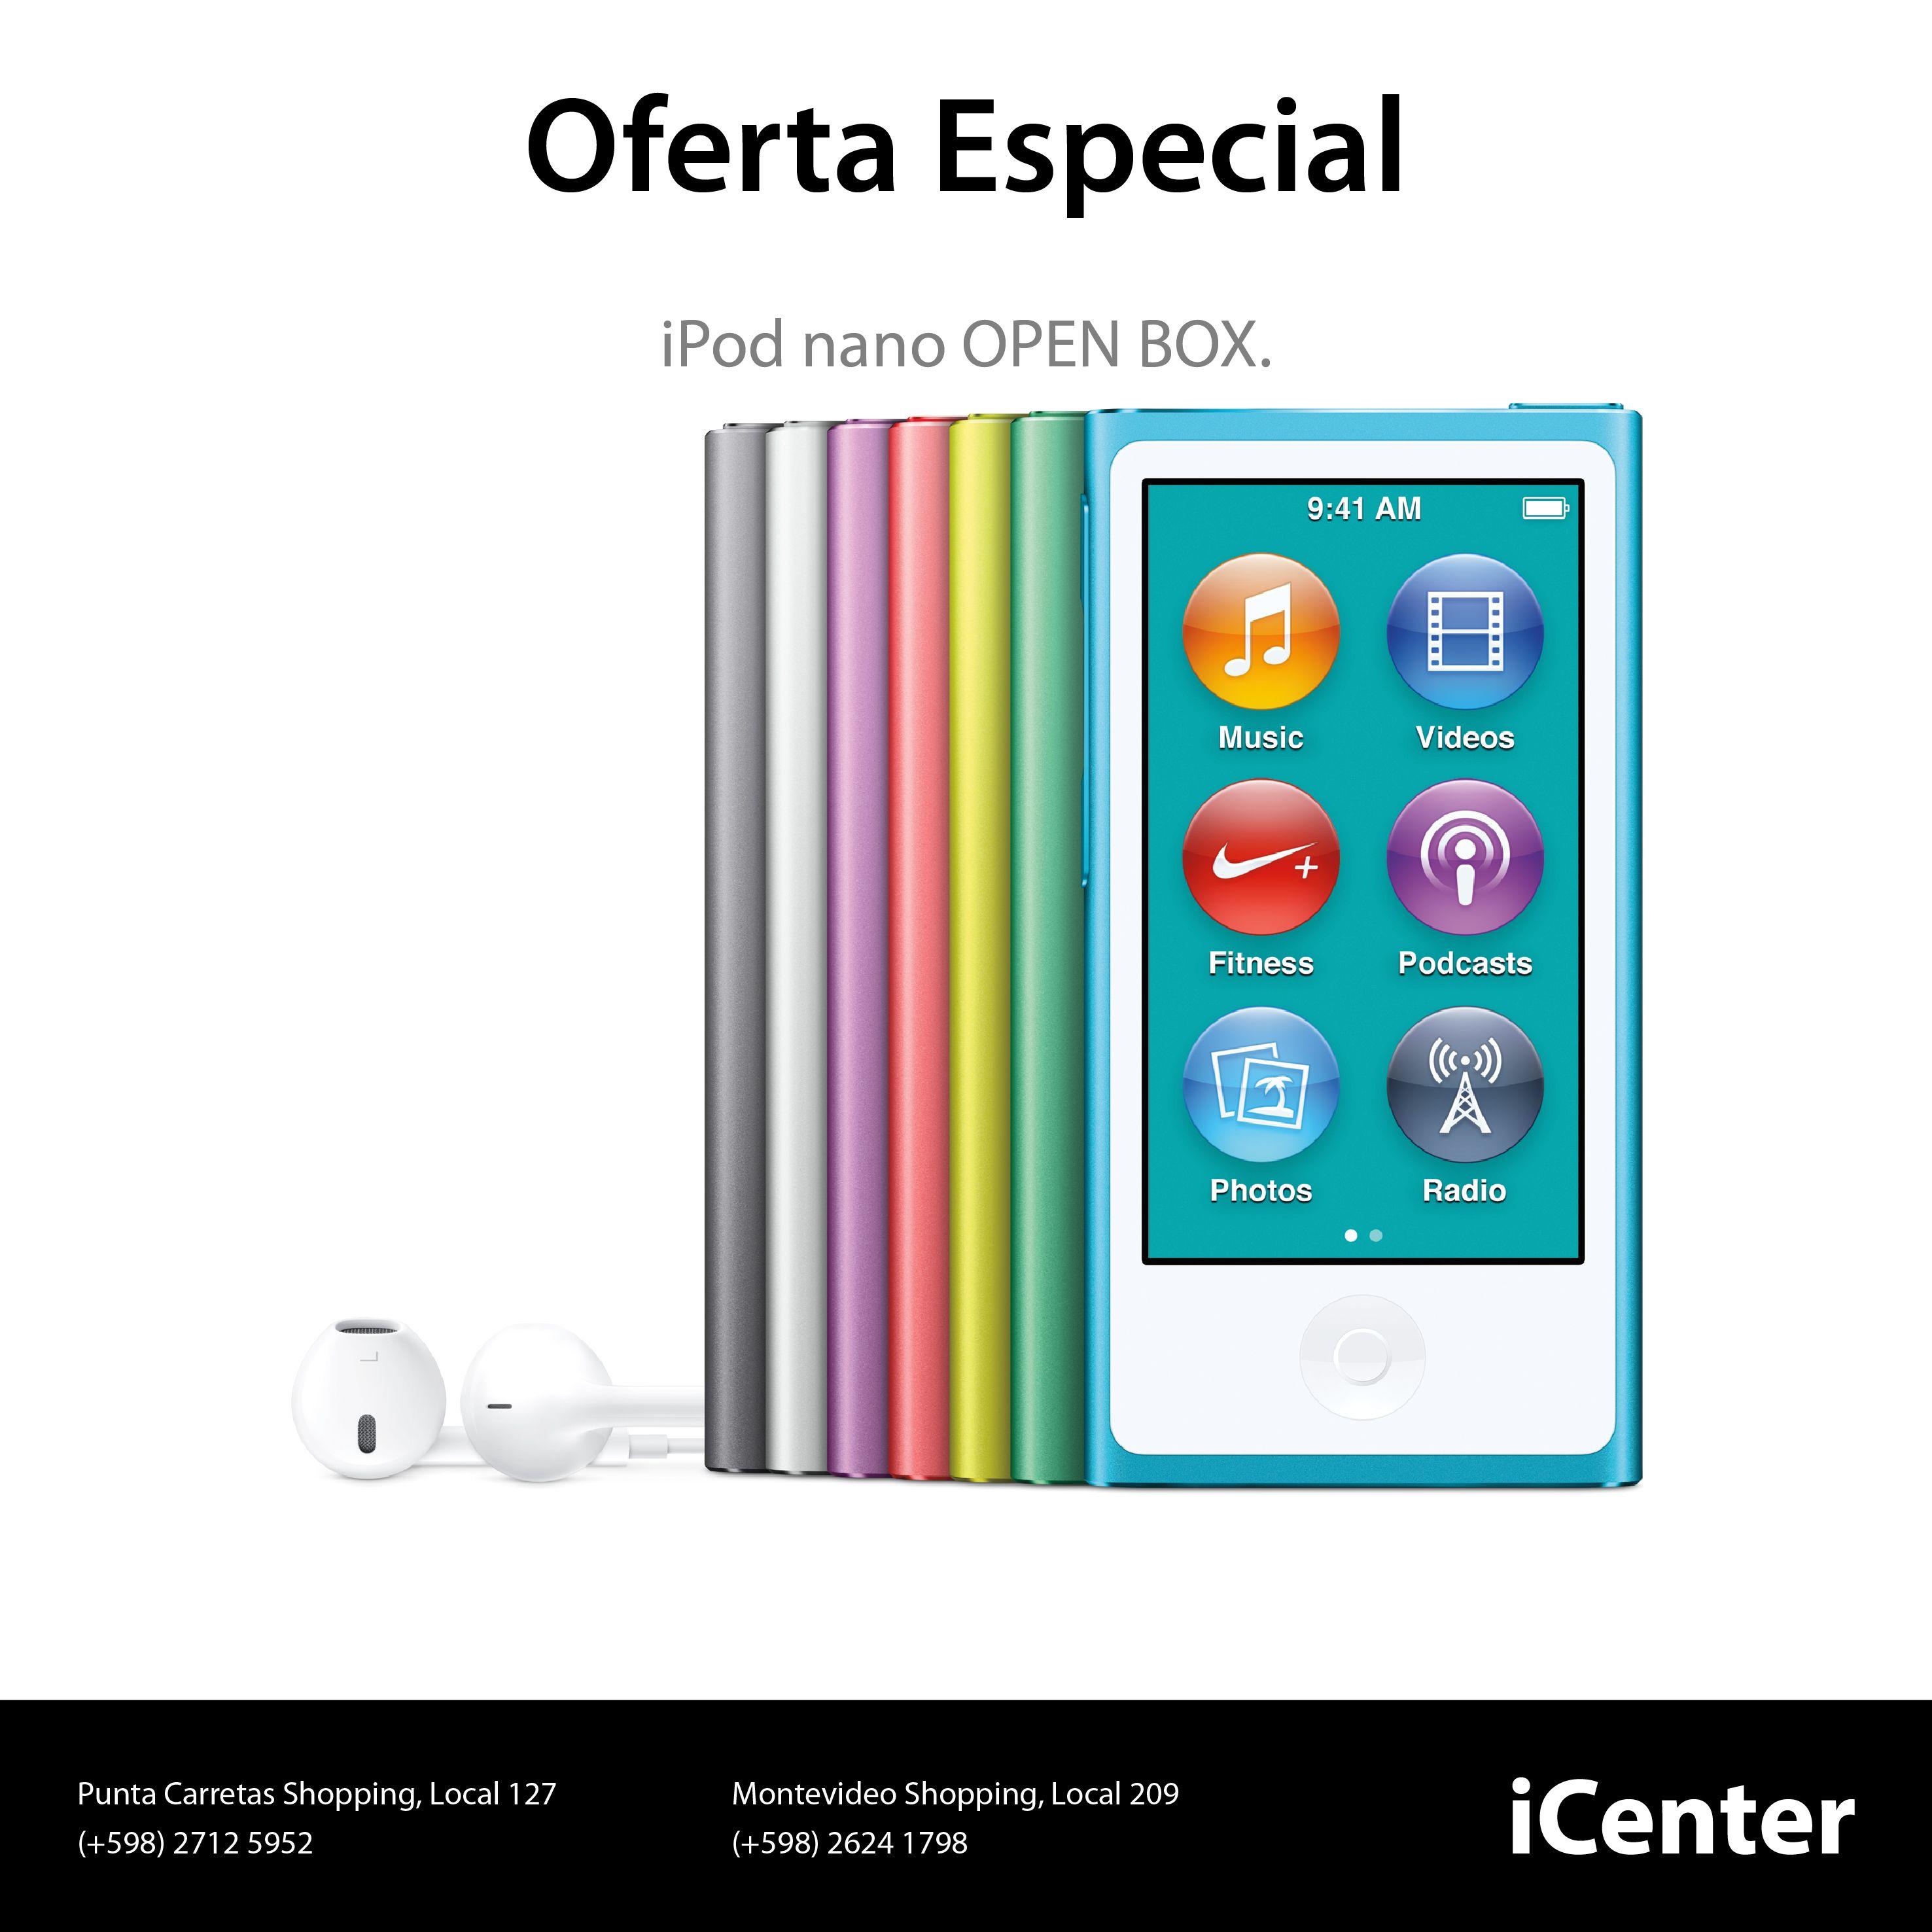 Oferta Especial. iPod nano Open Box. iPod nano de 7